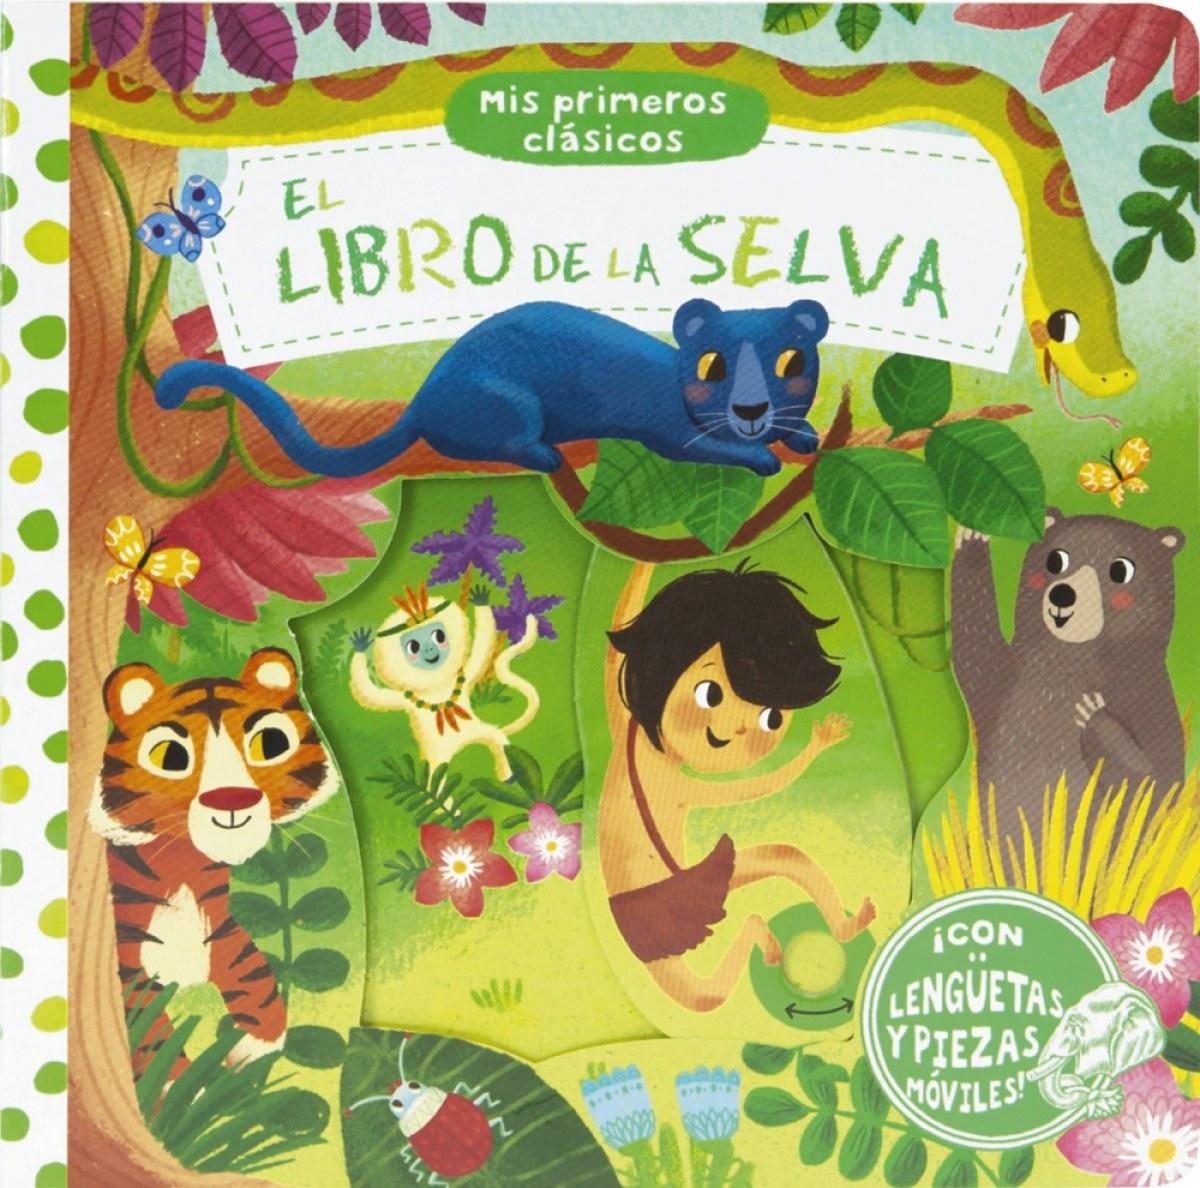 El libro de la selva 9788469604403